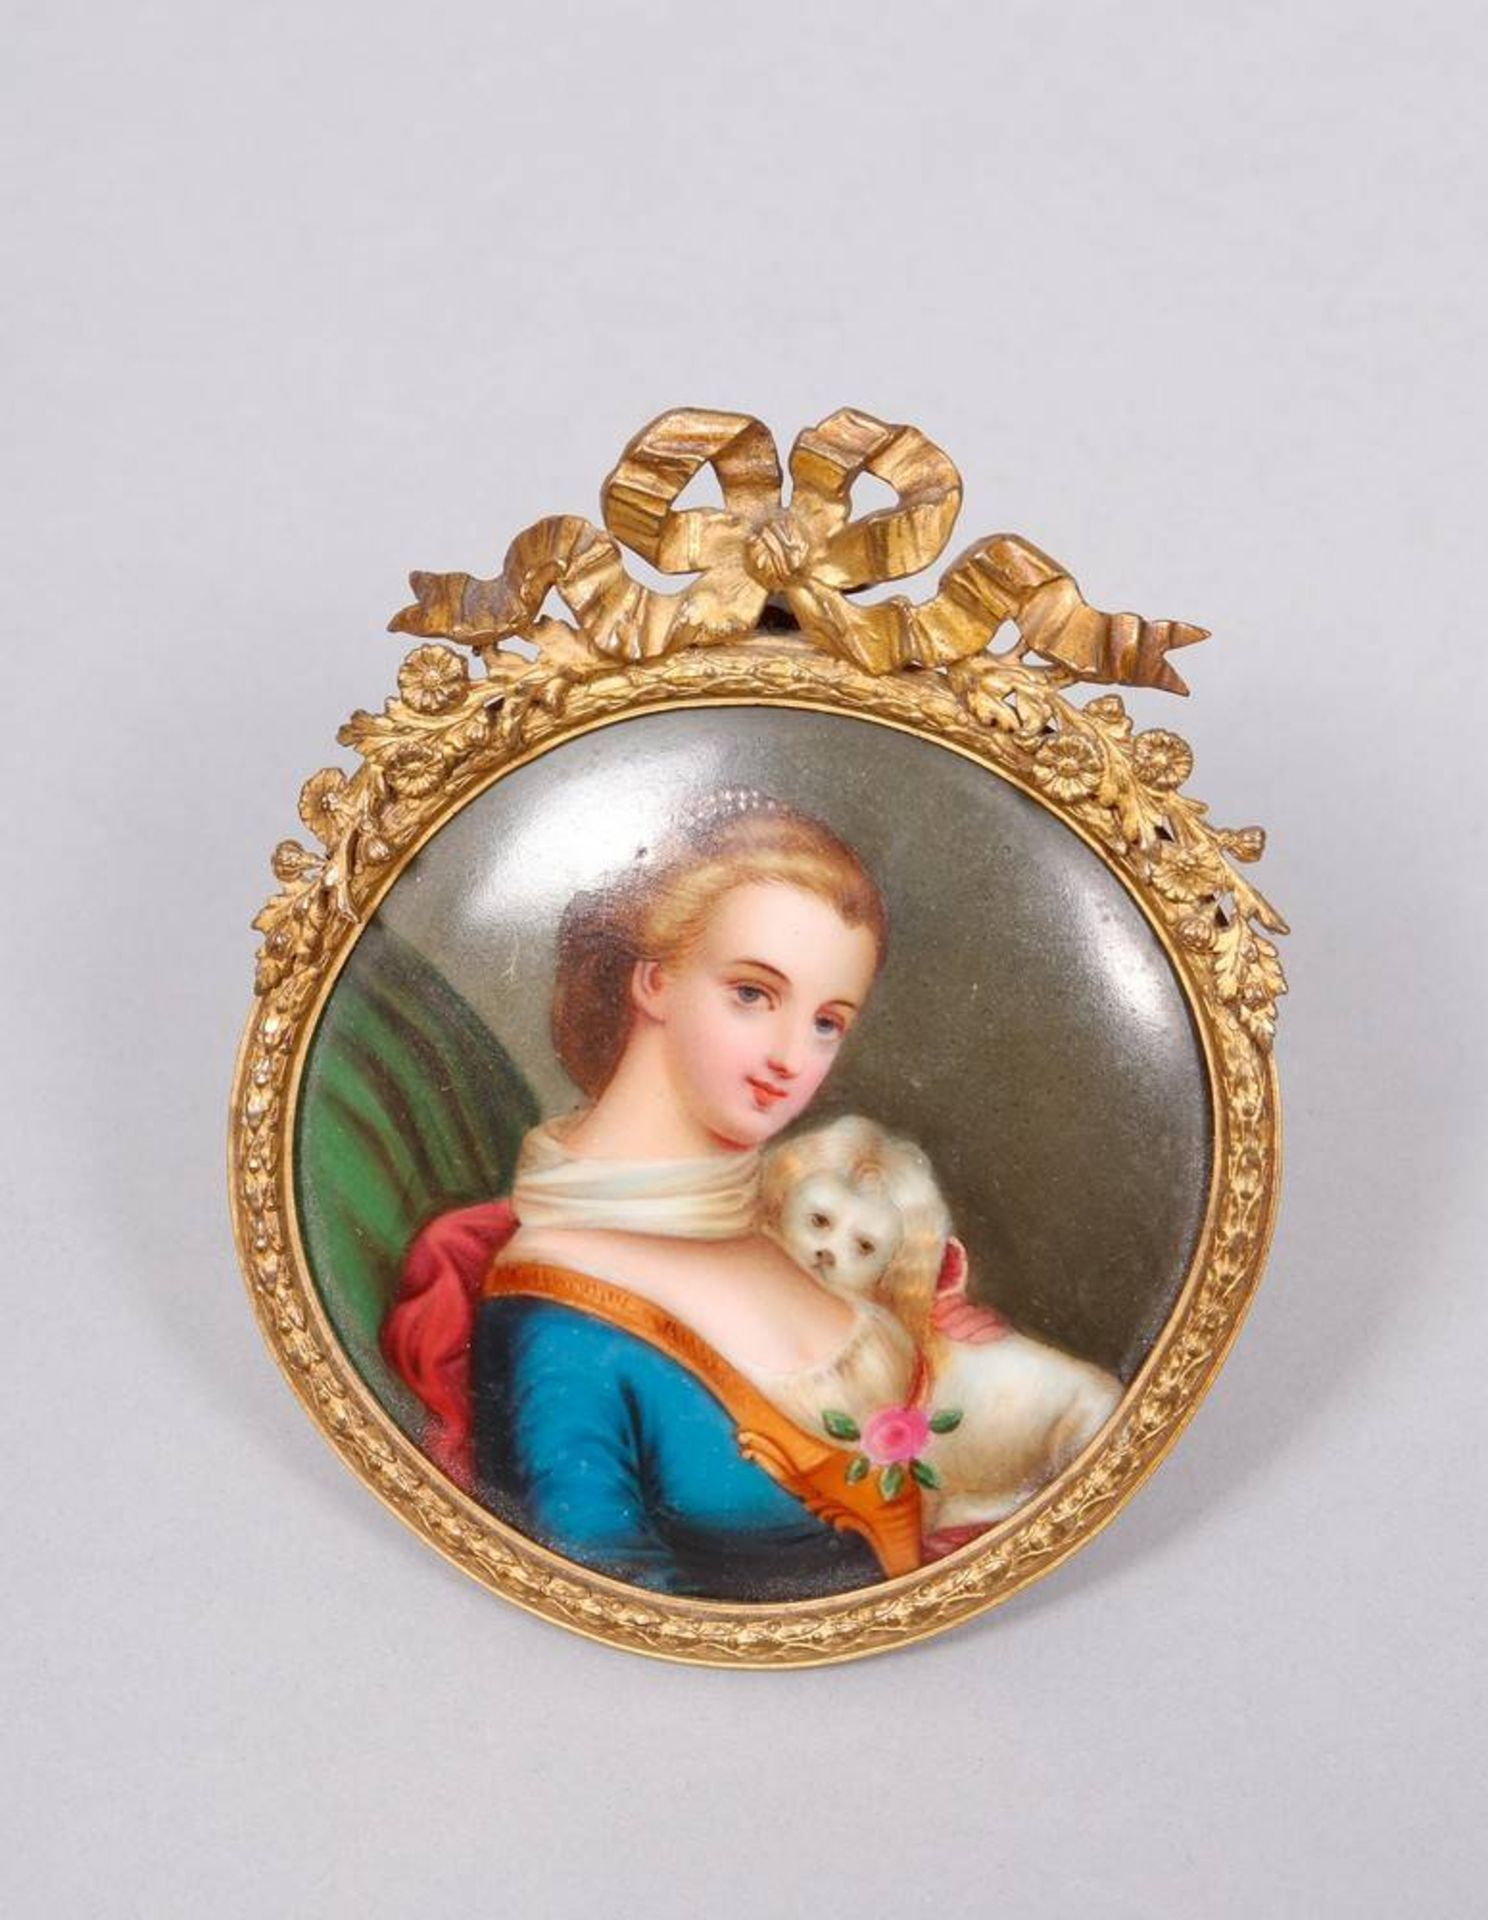 Miniatur, wohl Frankreich, 19.Jh., Porzellan, polychrom bemalt